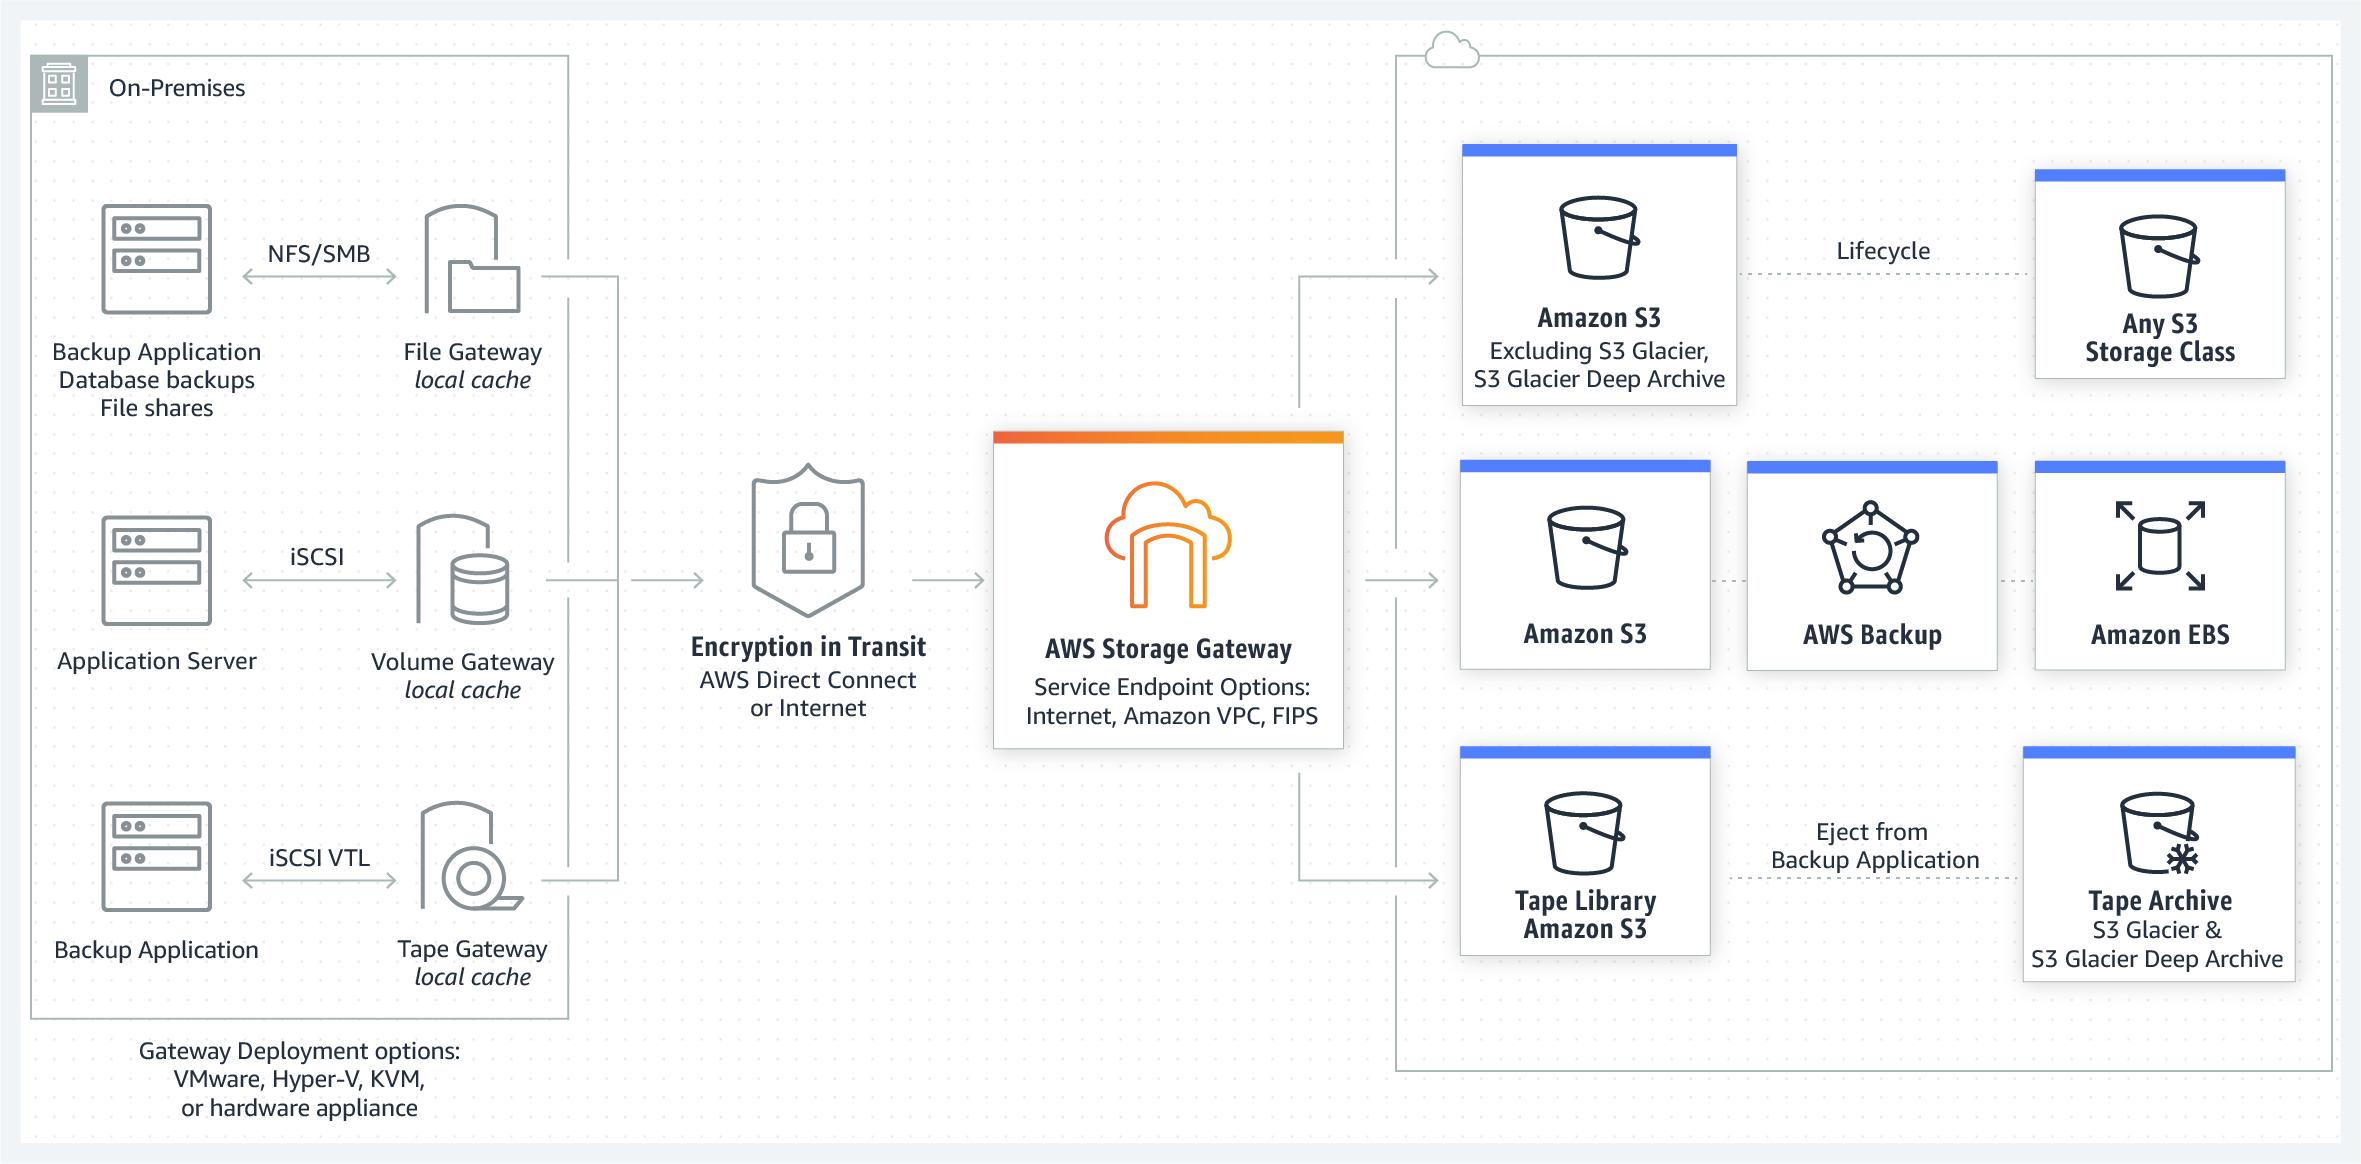 Figure 1 - AWS Storage Gateway options – File, Volume, and Tape Gateways